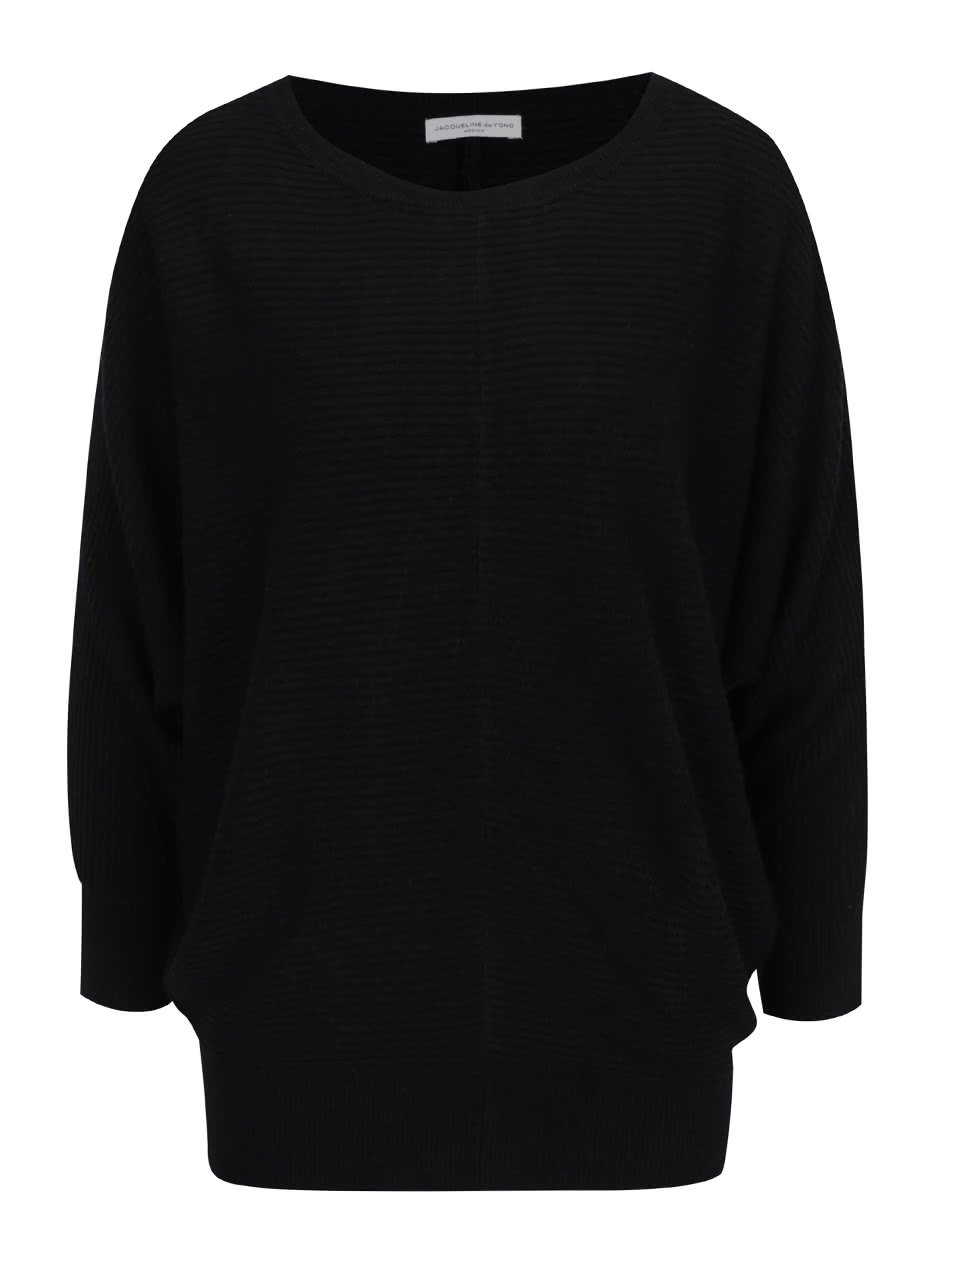 Černý žebrovaný svetr s netopýřími rukávy Jacqueline de Yong Flip